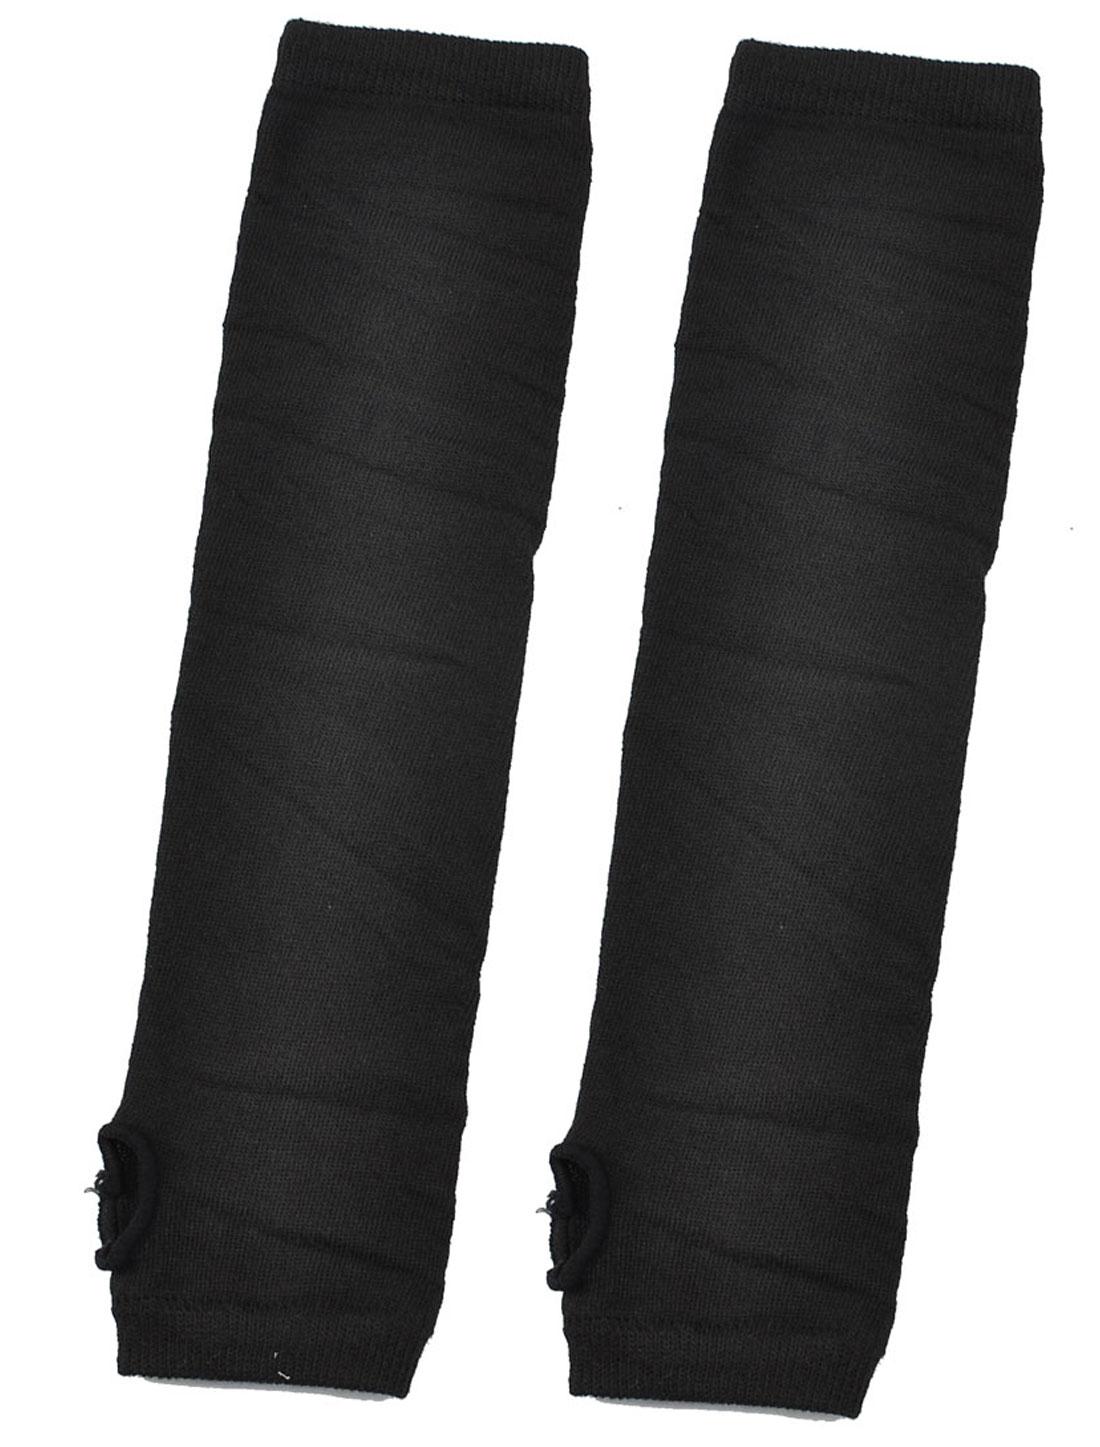 Ladies Black Acrylic Fingerless Thumbhole Arm Warmer Elbow Gloves Pair